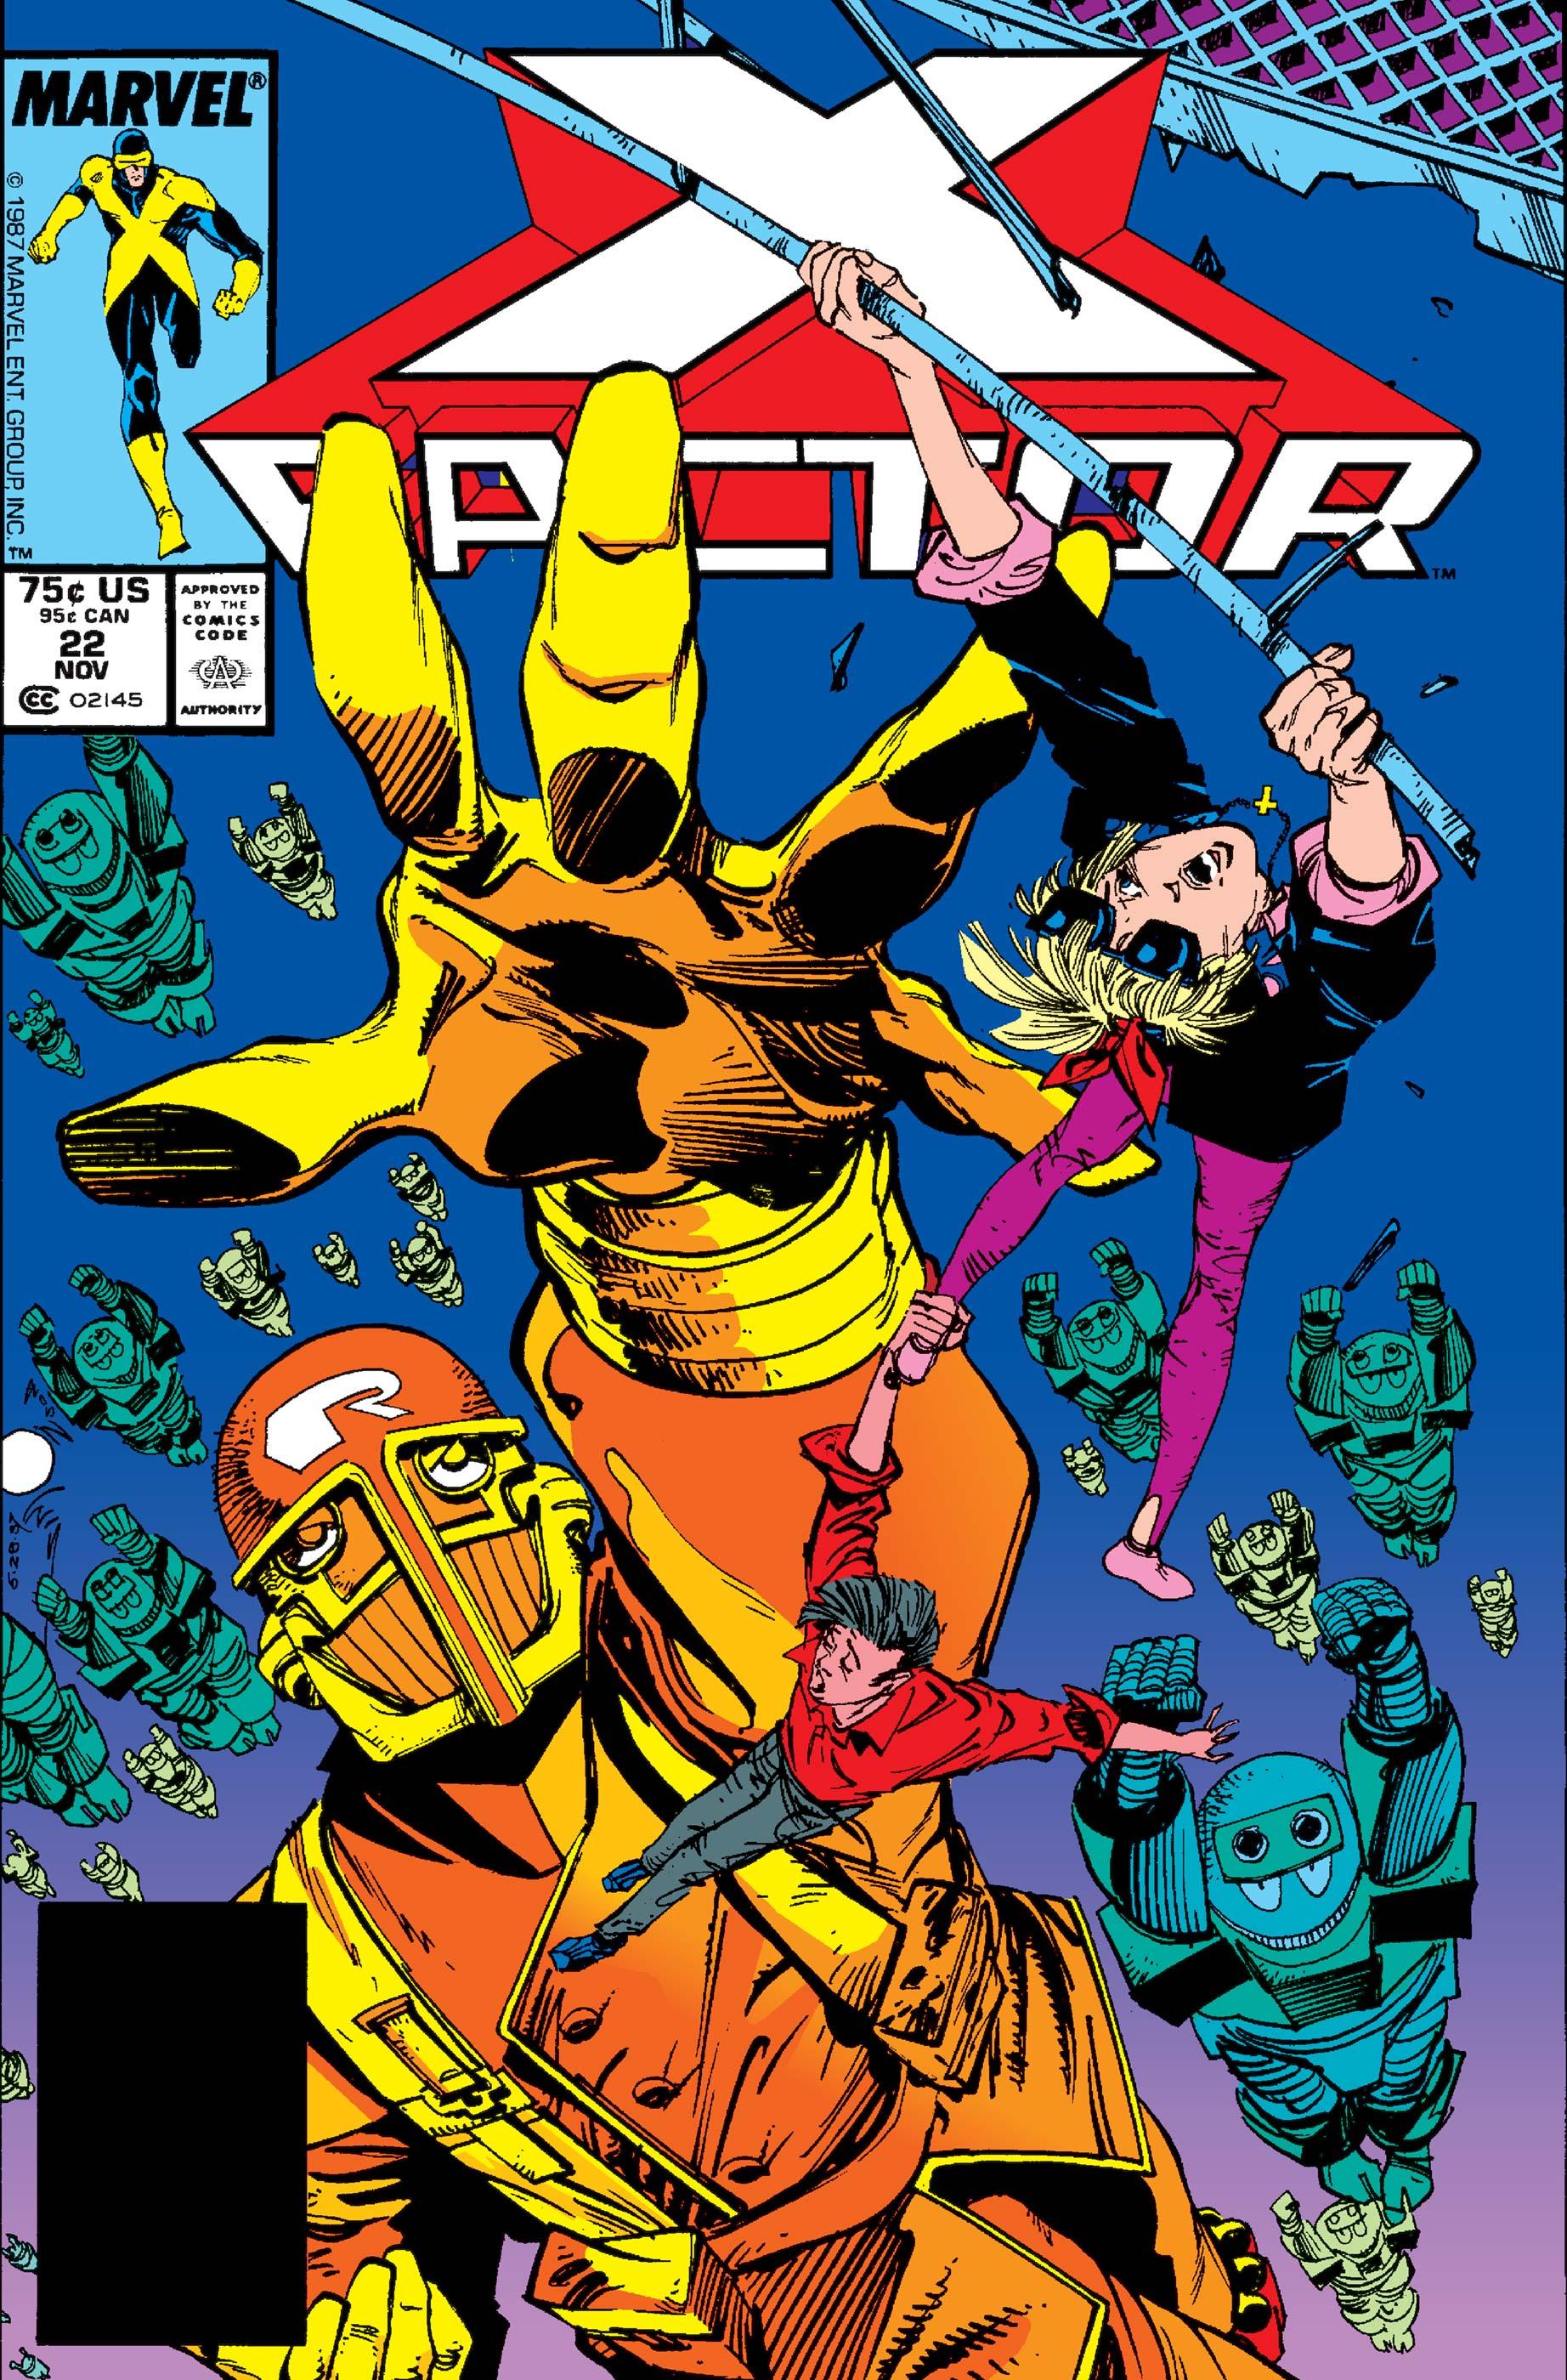 X-Factor (1986) #22